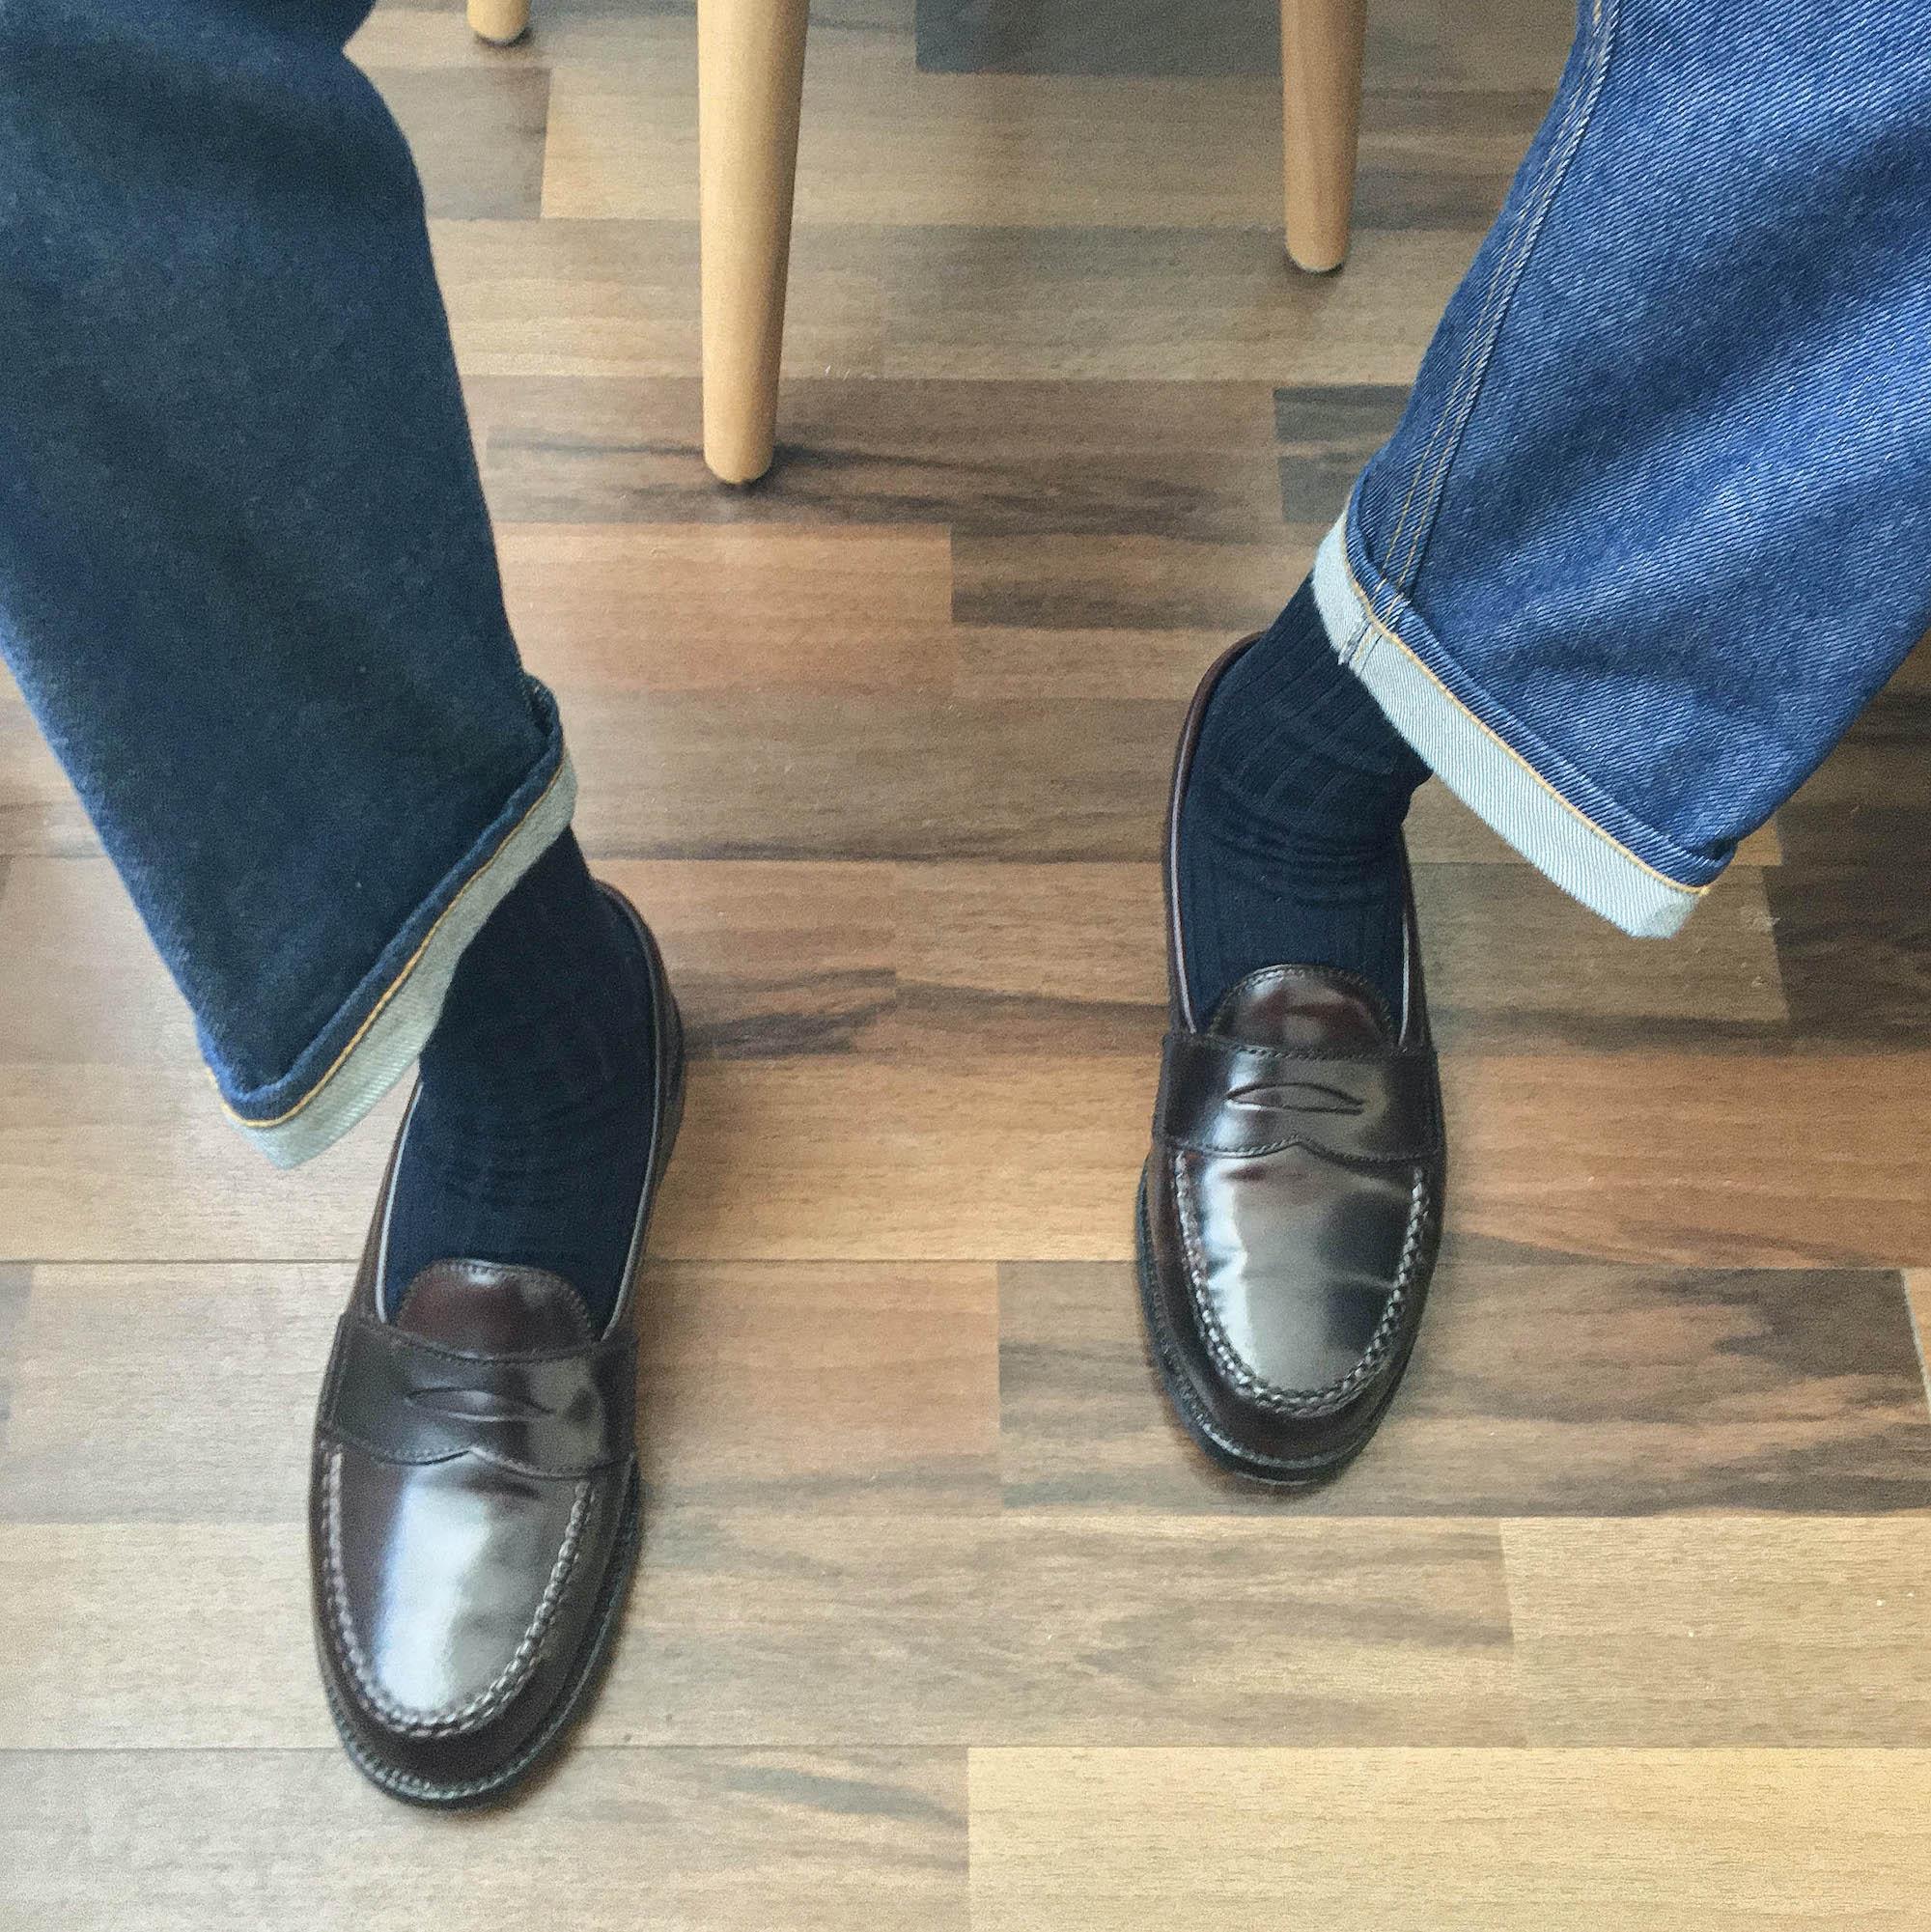 Alden Penny loafer 986 cordovan jean